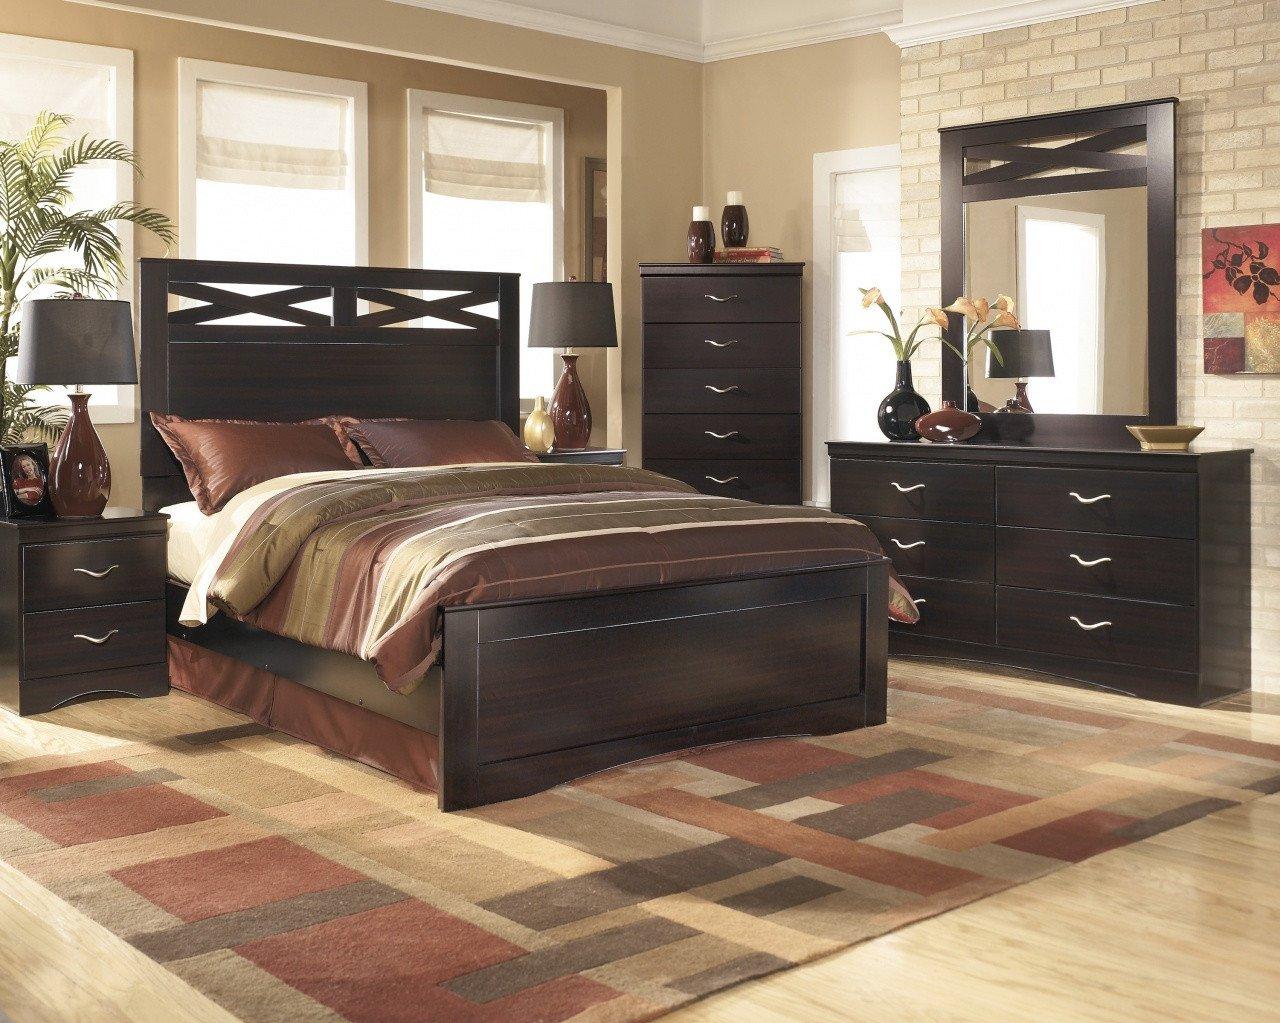 Ashley Furniture Bedroom Set Price Lovely ashley Furniture Queen Bedroom Sets – the New Daily Nation